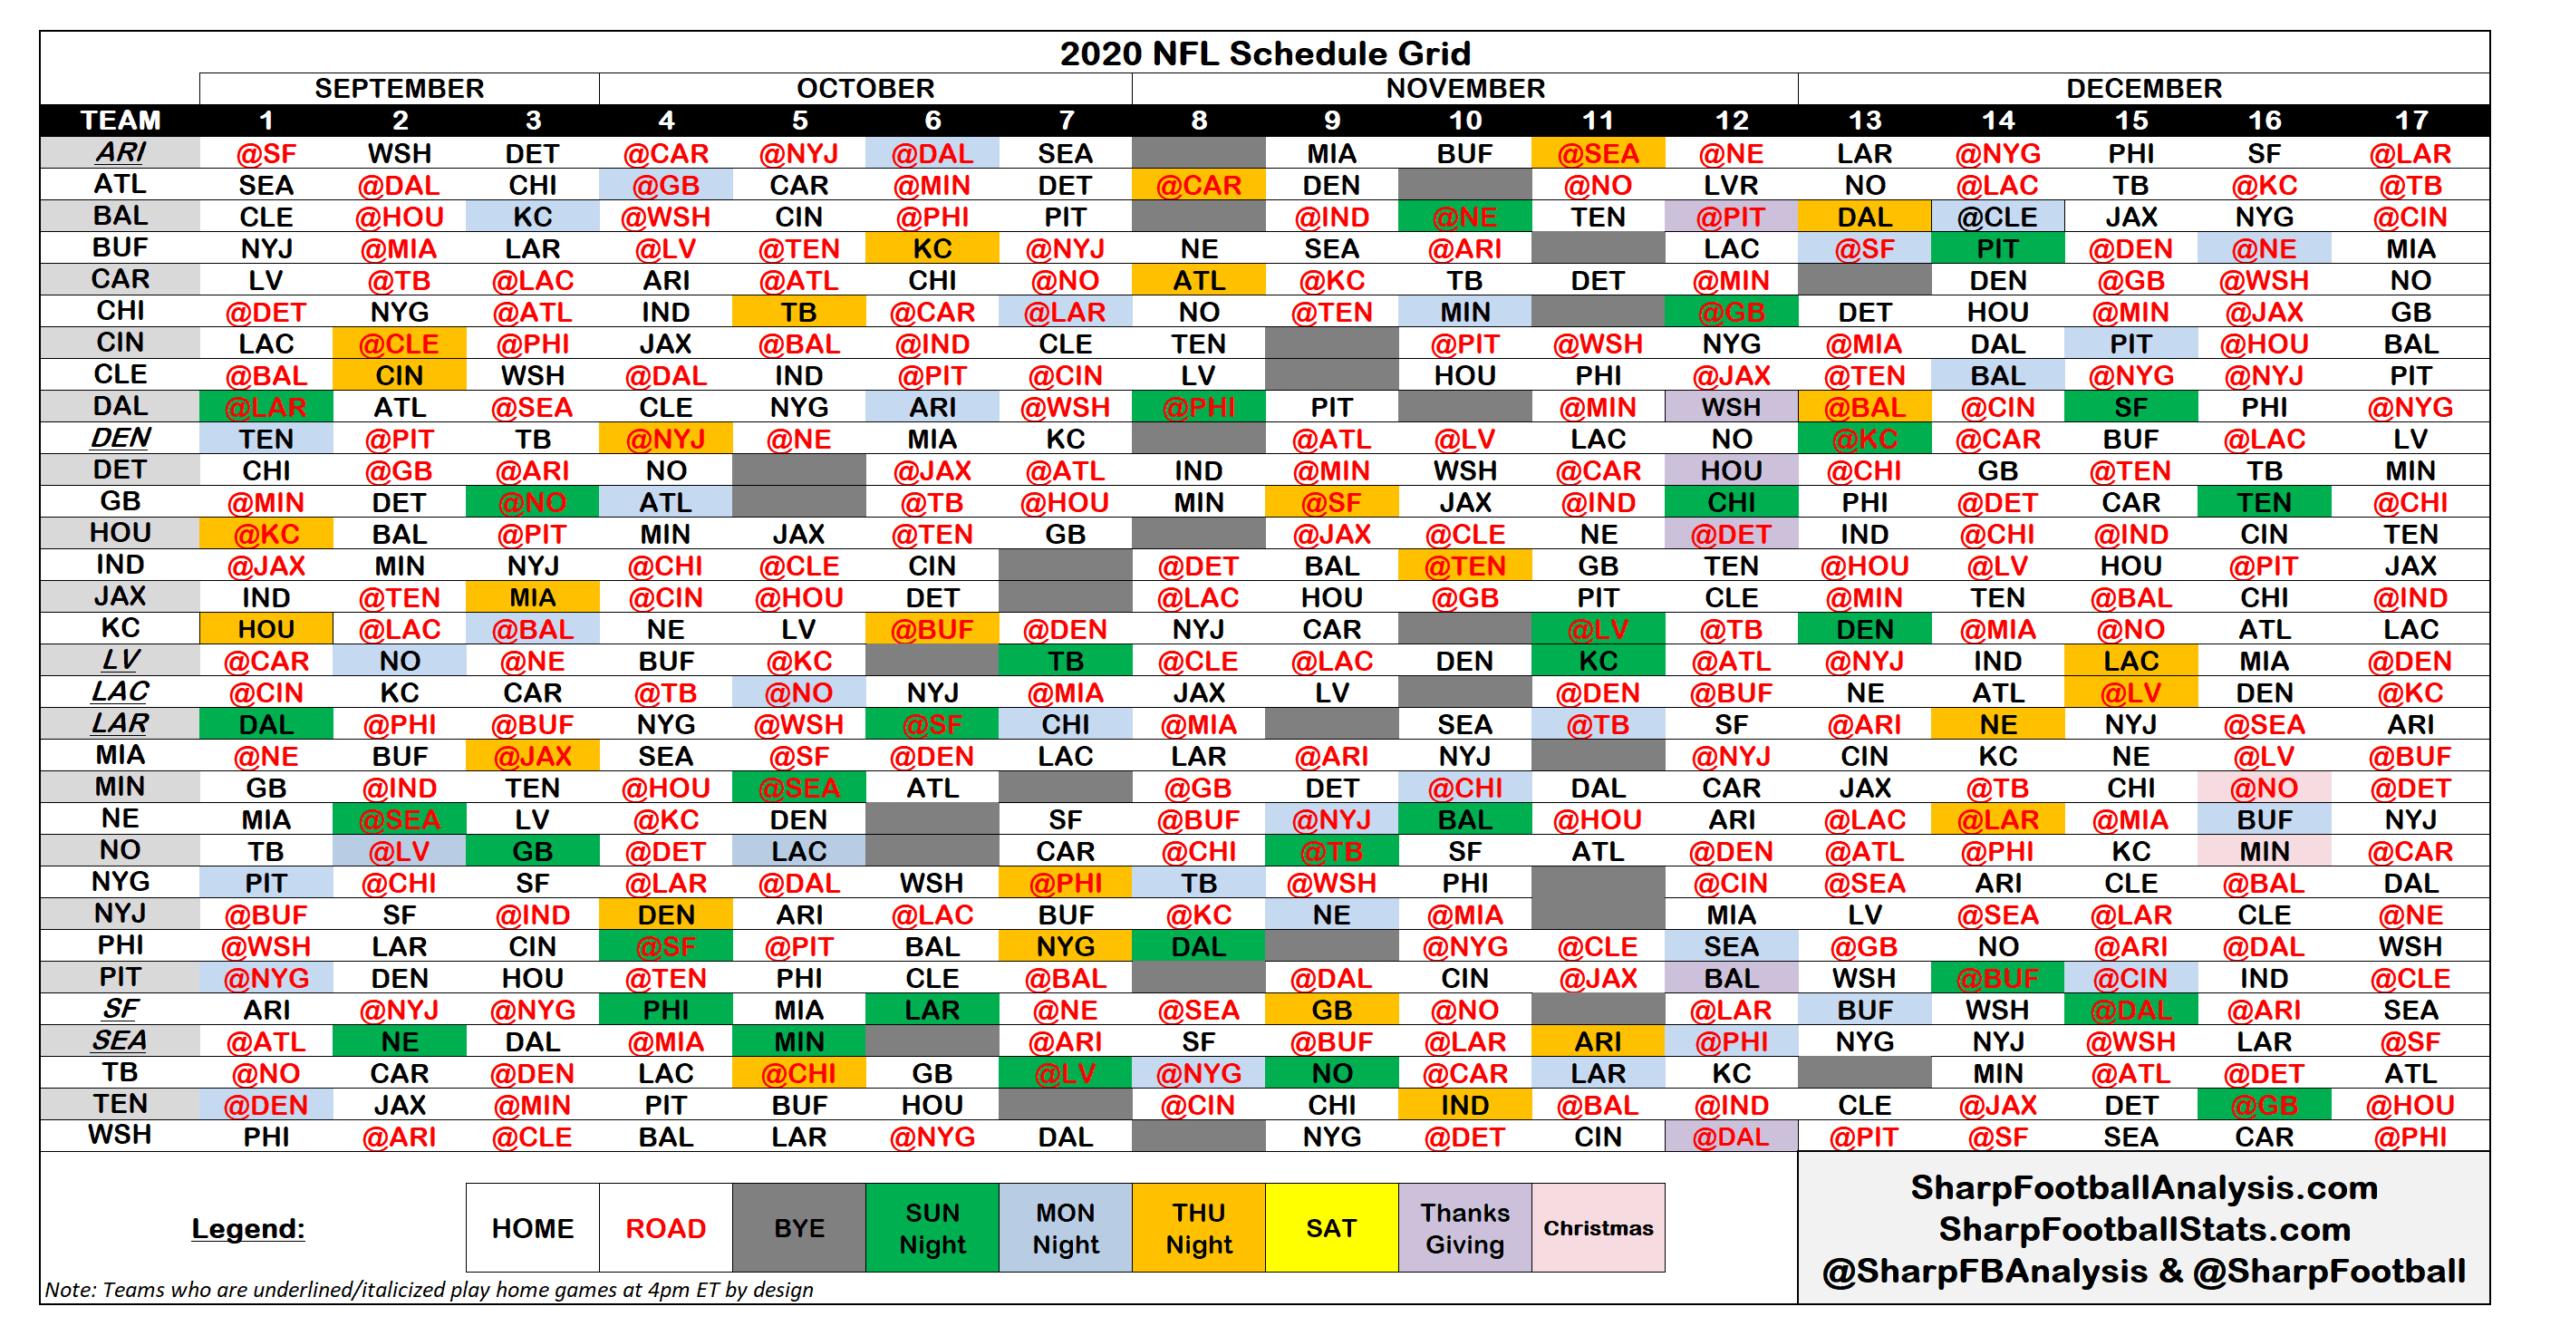 2020 Nfl Regular Season Schedule Grid & Strength Of Schedule intended for Printable Nfl 2021 Schedule